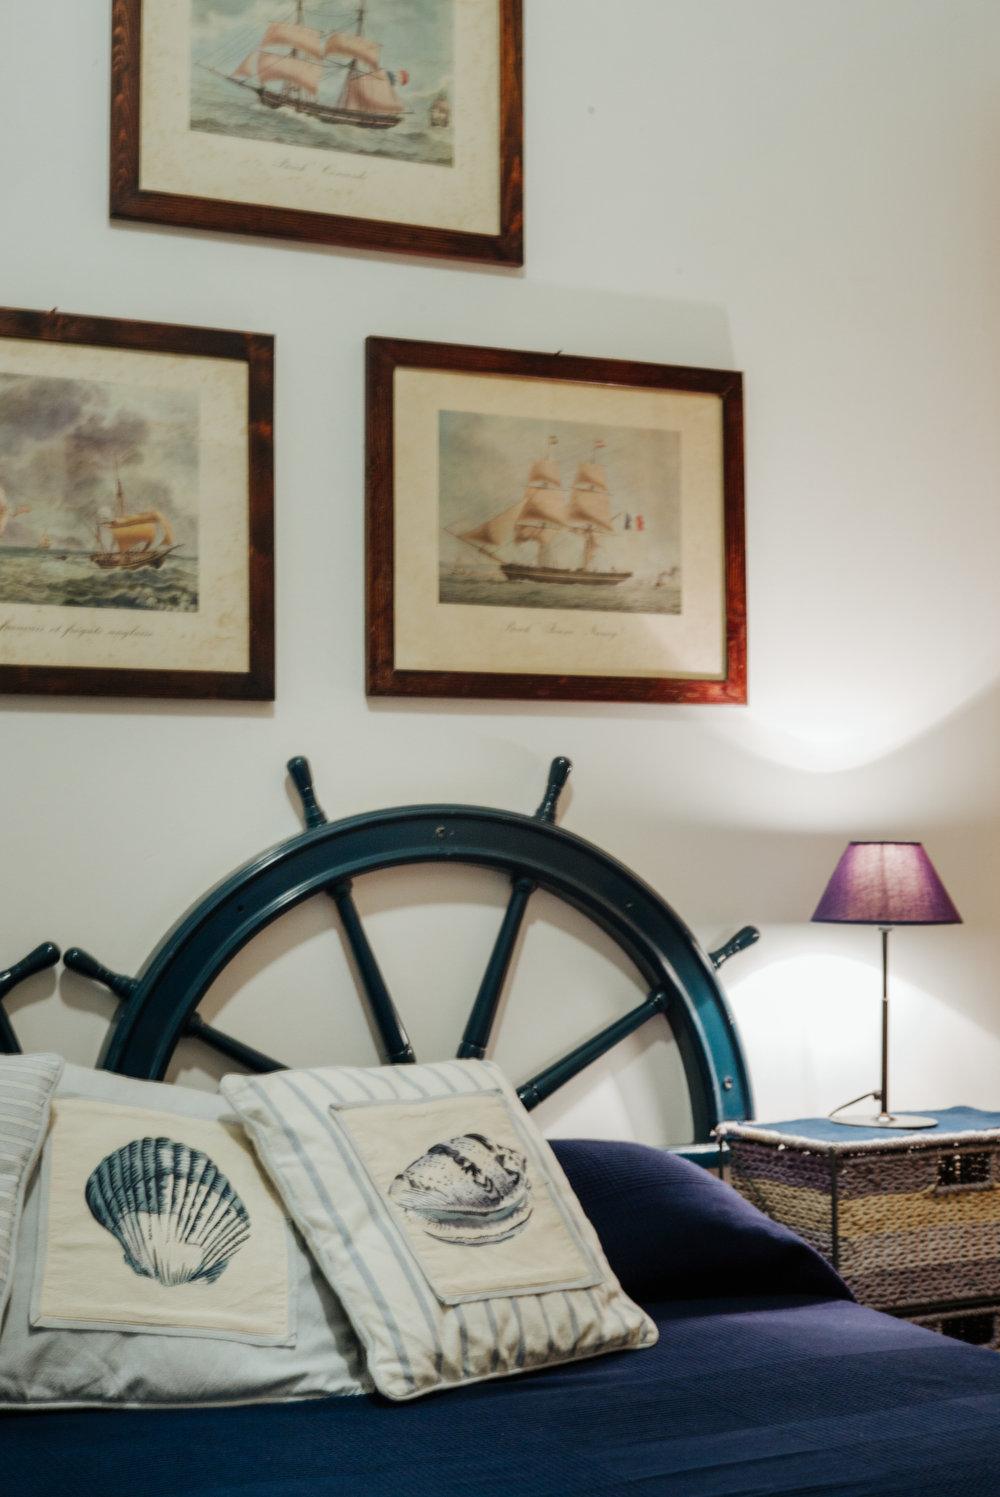 18sampieri-casa-vacanze-sicilia-appartamento-sicily-holiday-apartment-casazzurra-italia-italy.jpg